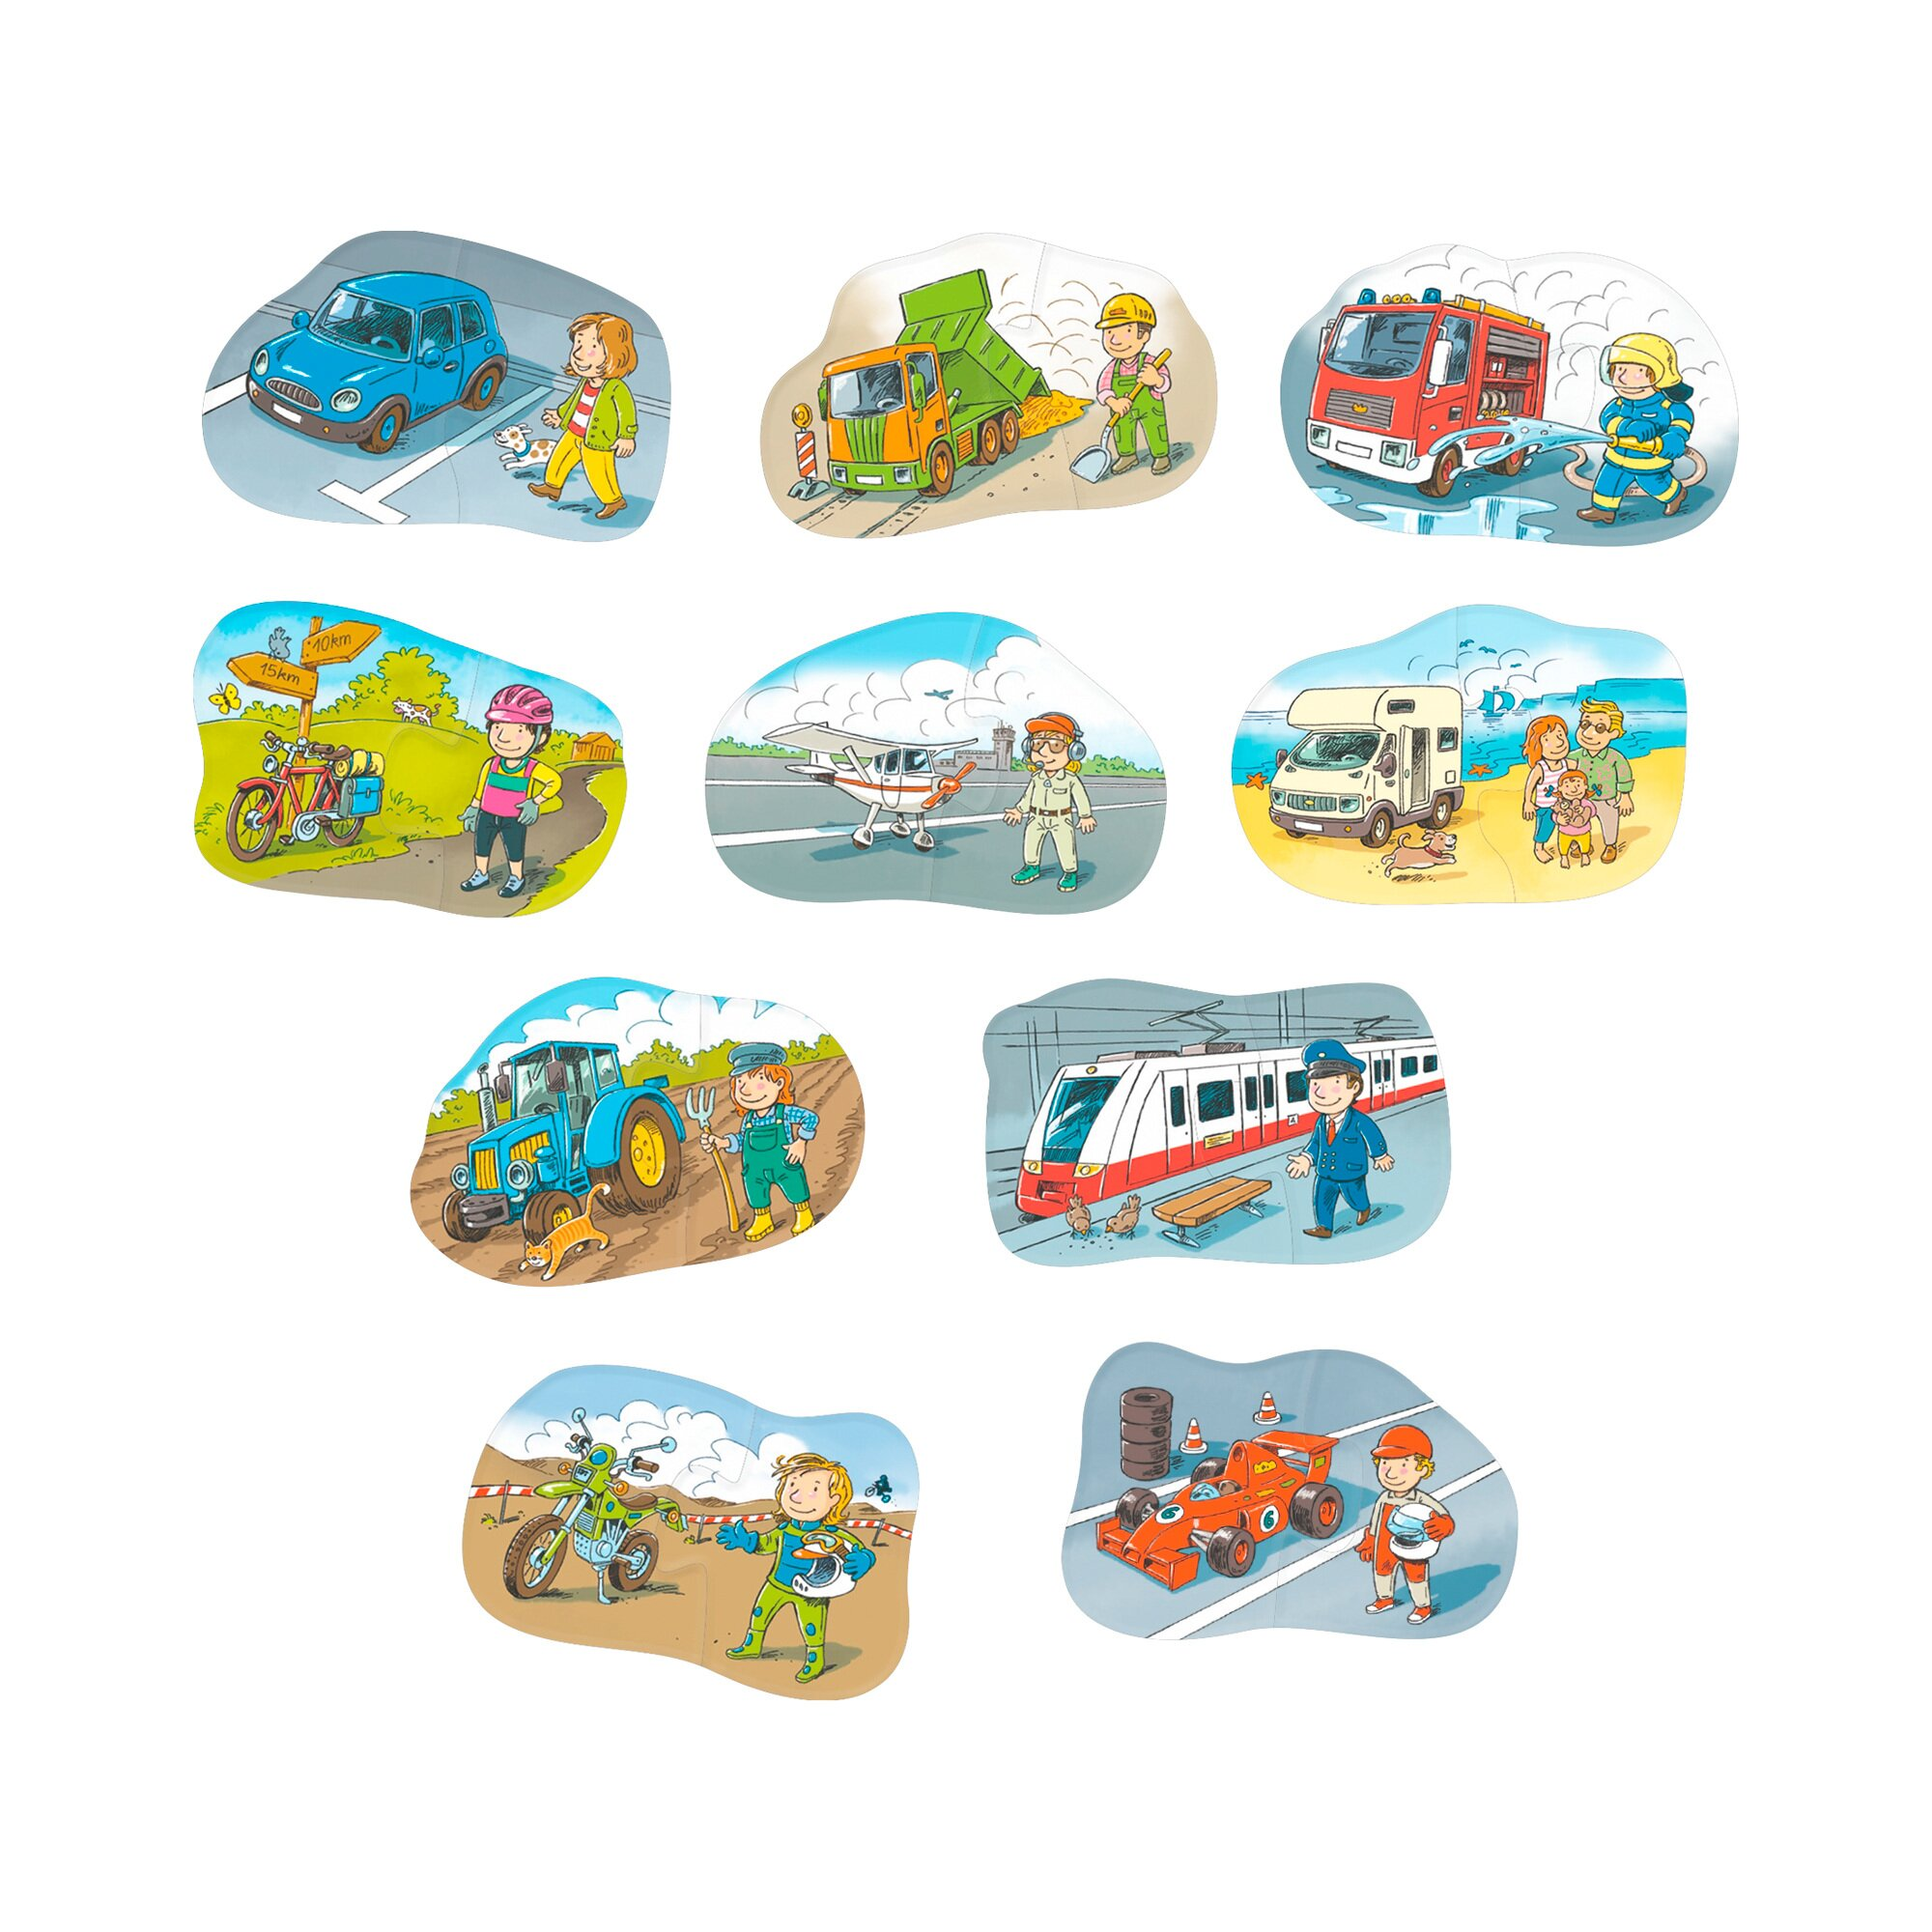 haba-1-2-puzzelei-fahrzeuge